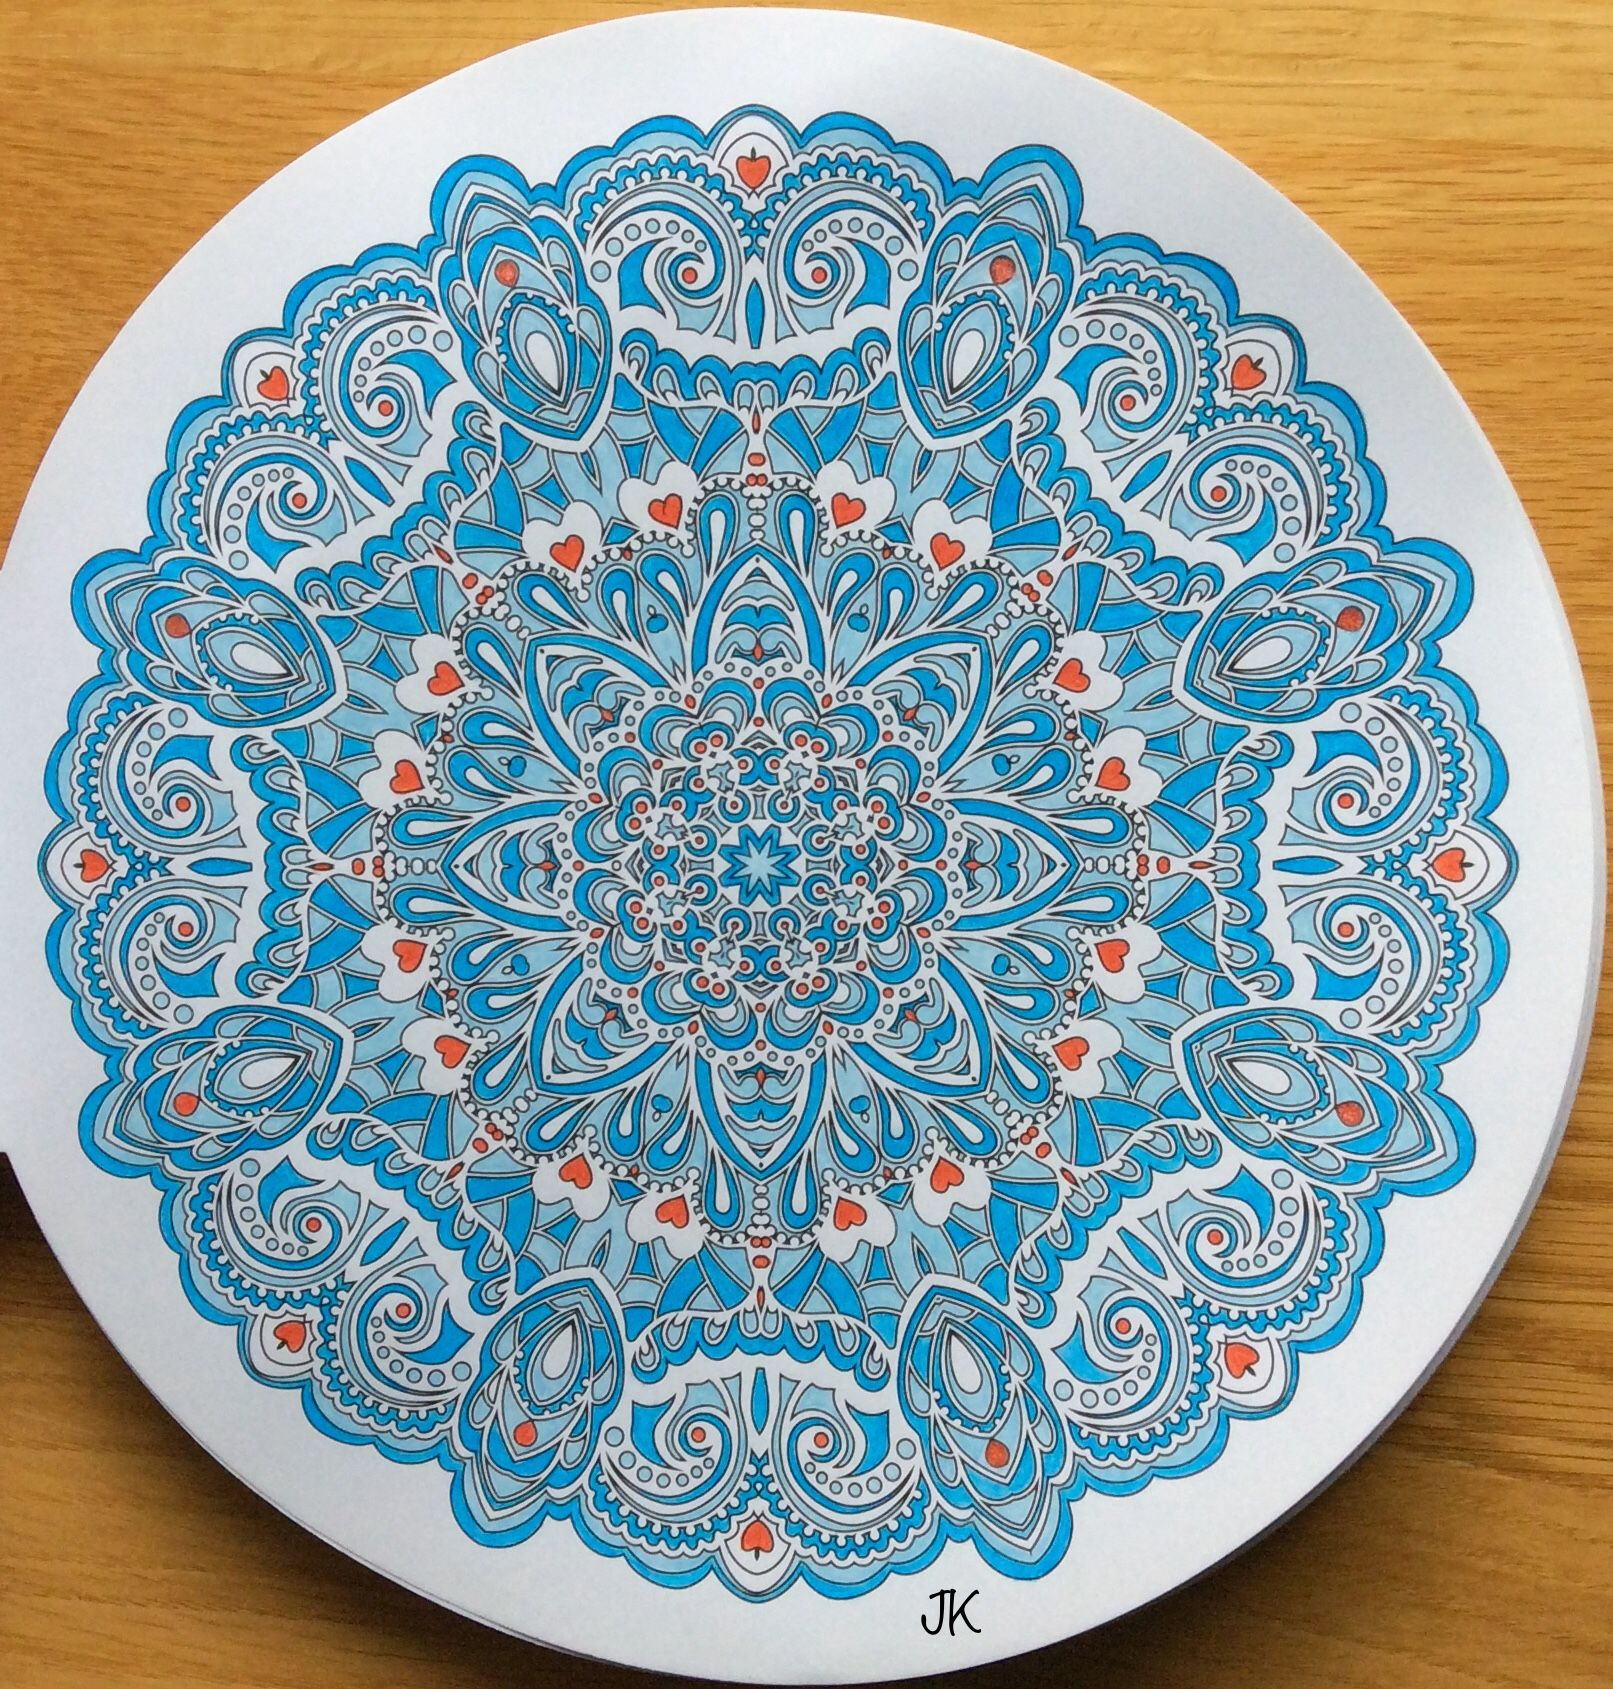 100 Creaties Mandala In 2020 Mandala Kleuren